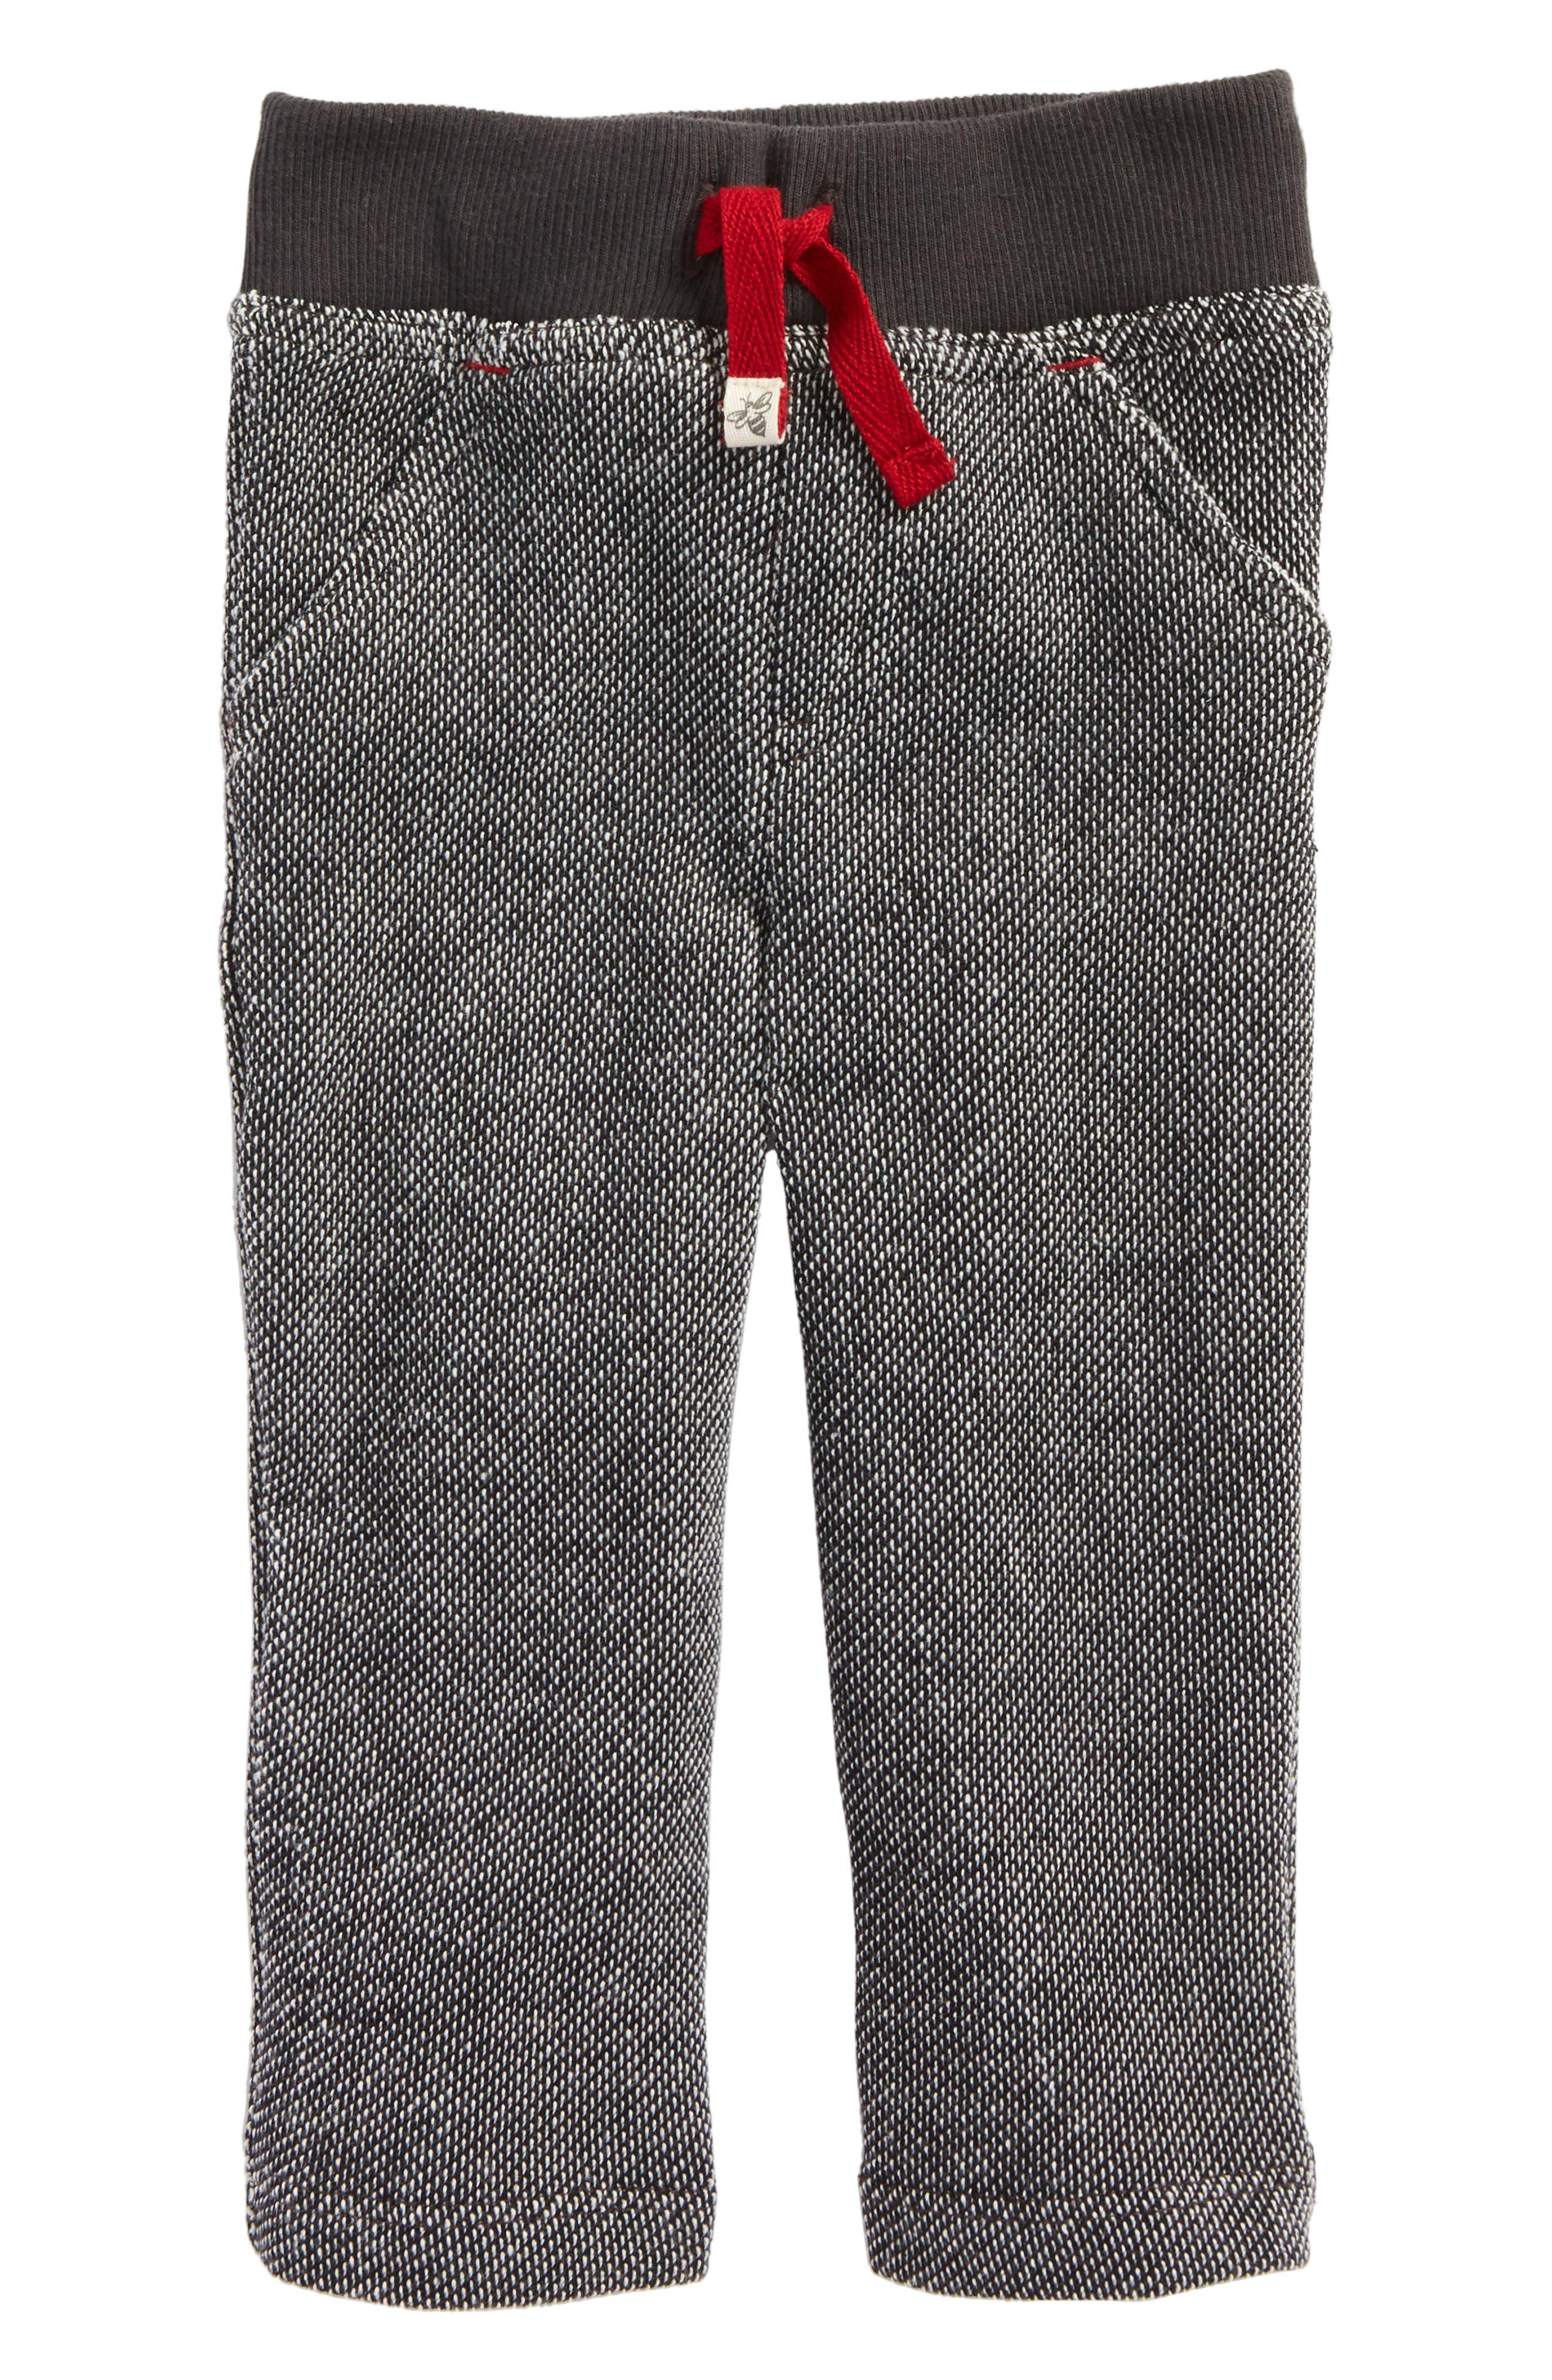 Burt's Bees Baby Piqué Organic Cotton Pants (Baby Boys)